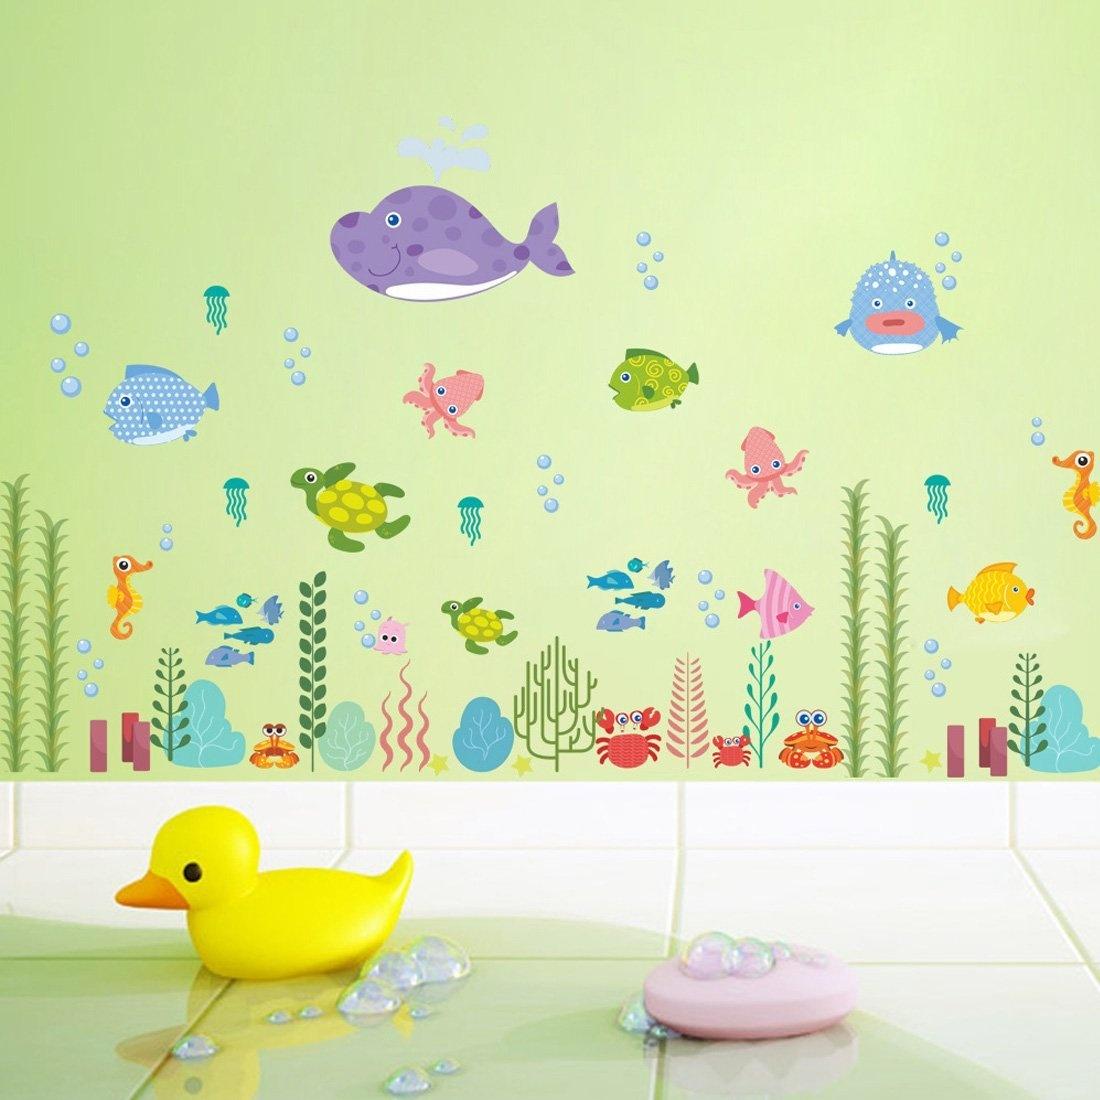 Fine Wall Decor Stickers Nz Sketch - The Wall Art Decorations ...